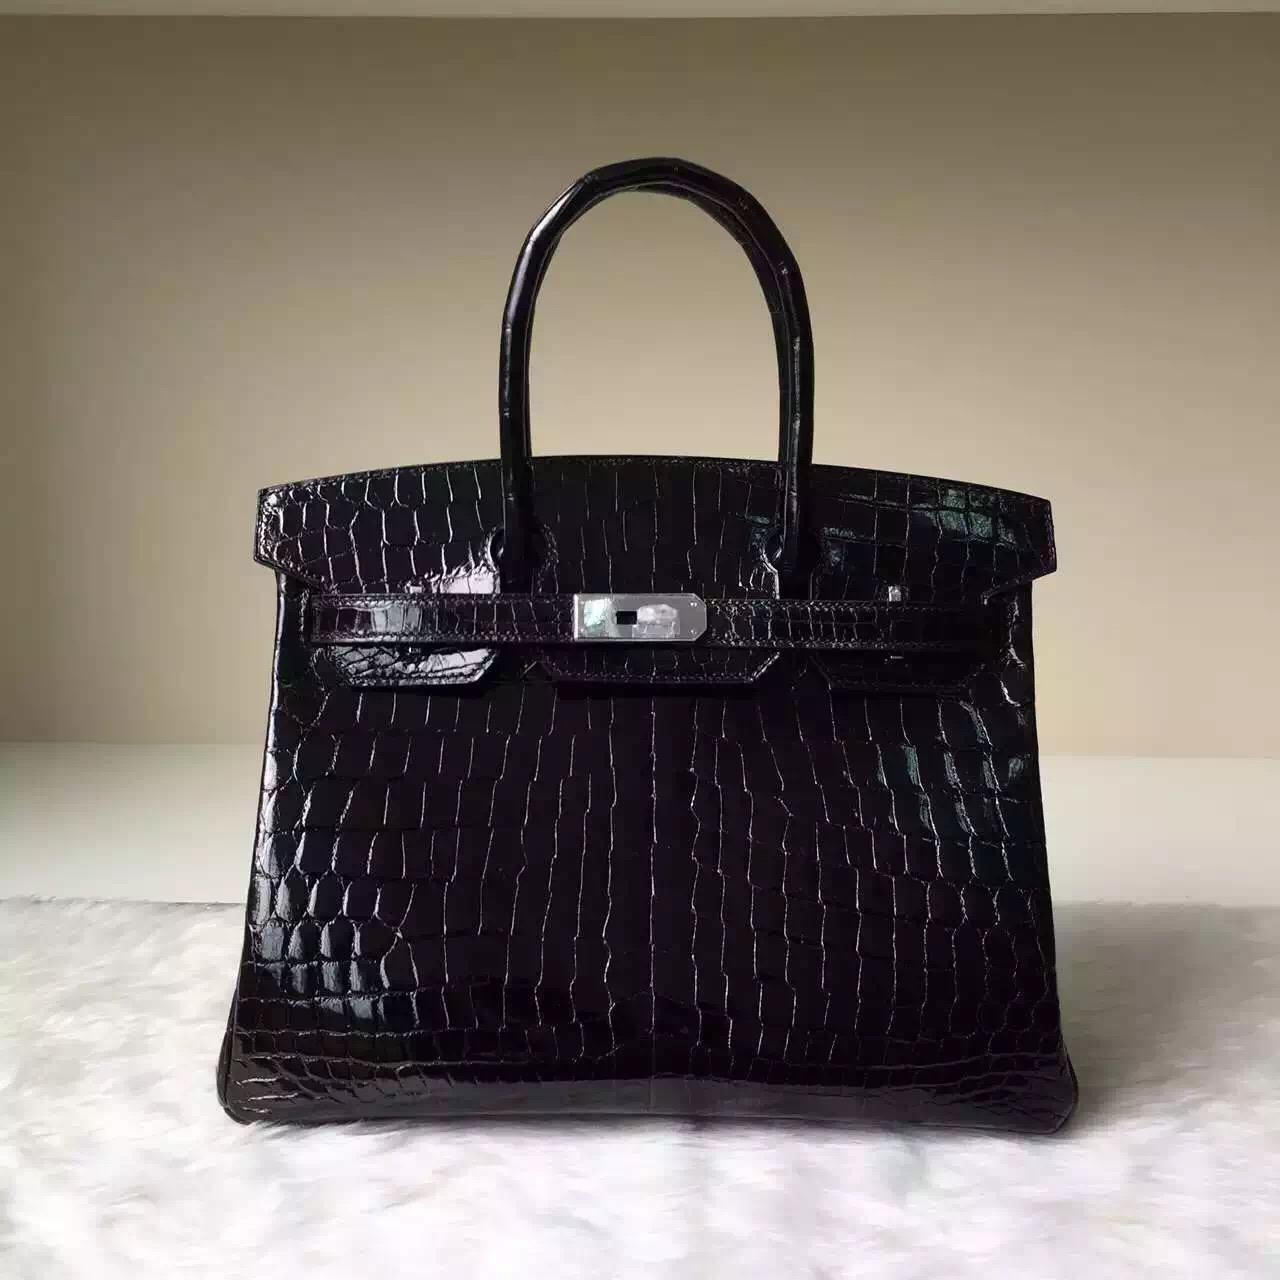 Noble Women's Bag Hermes CK89 Black Shiny Crocodile Leather Birkin30